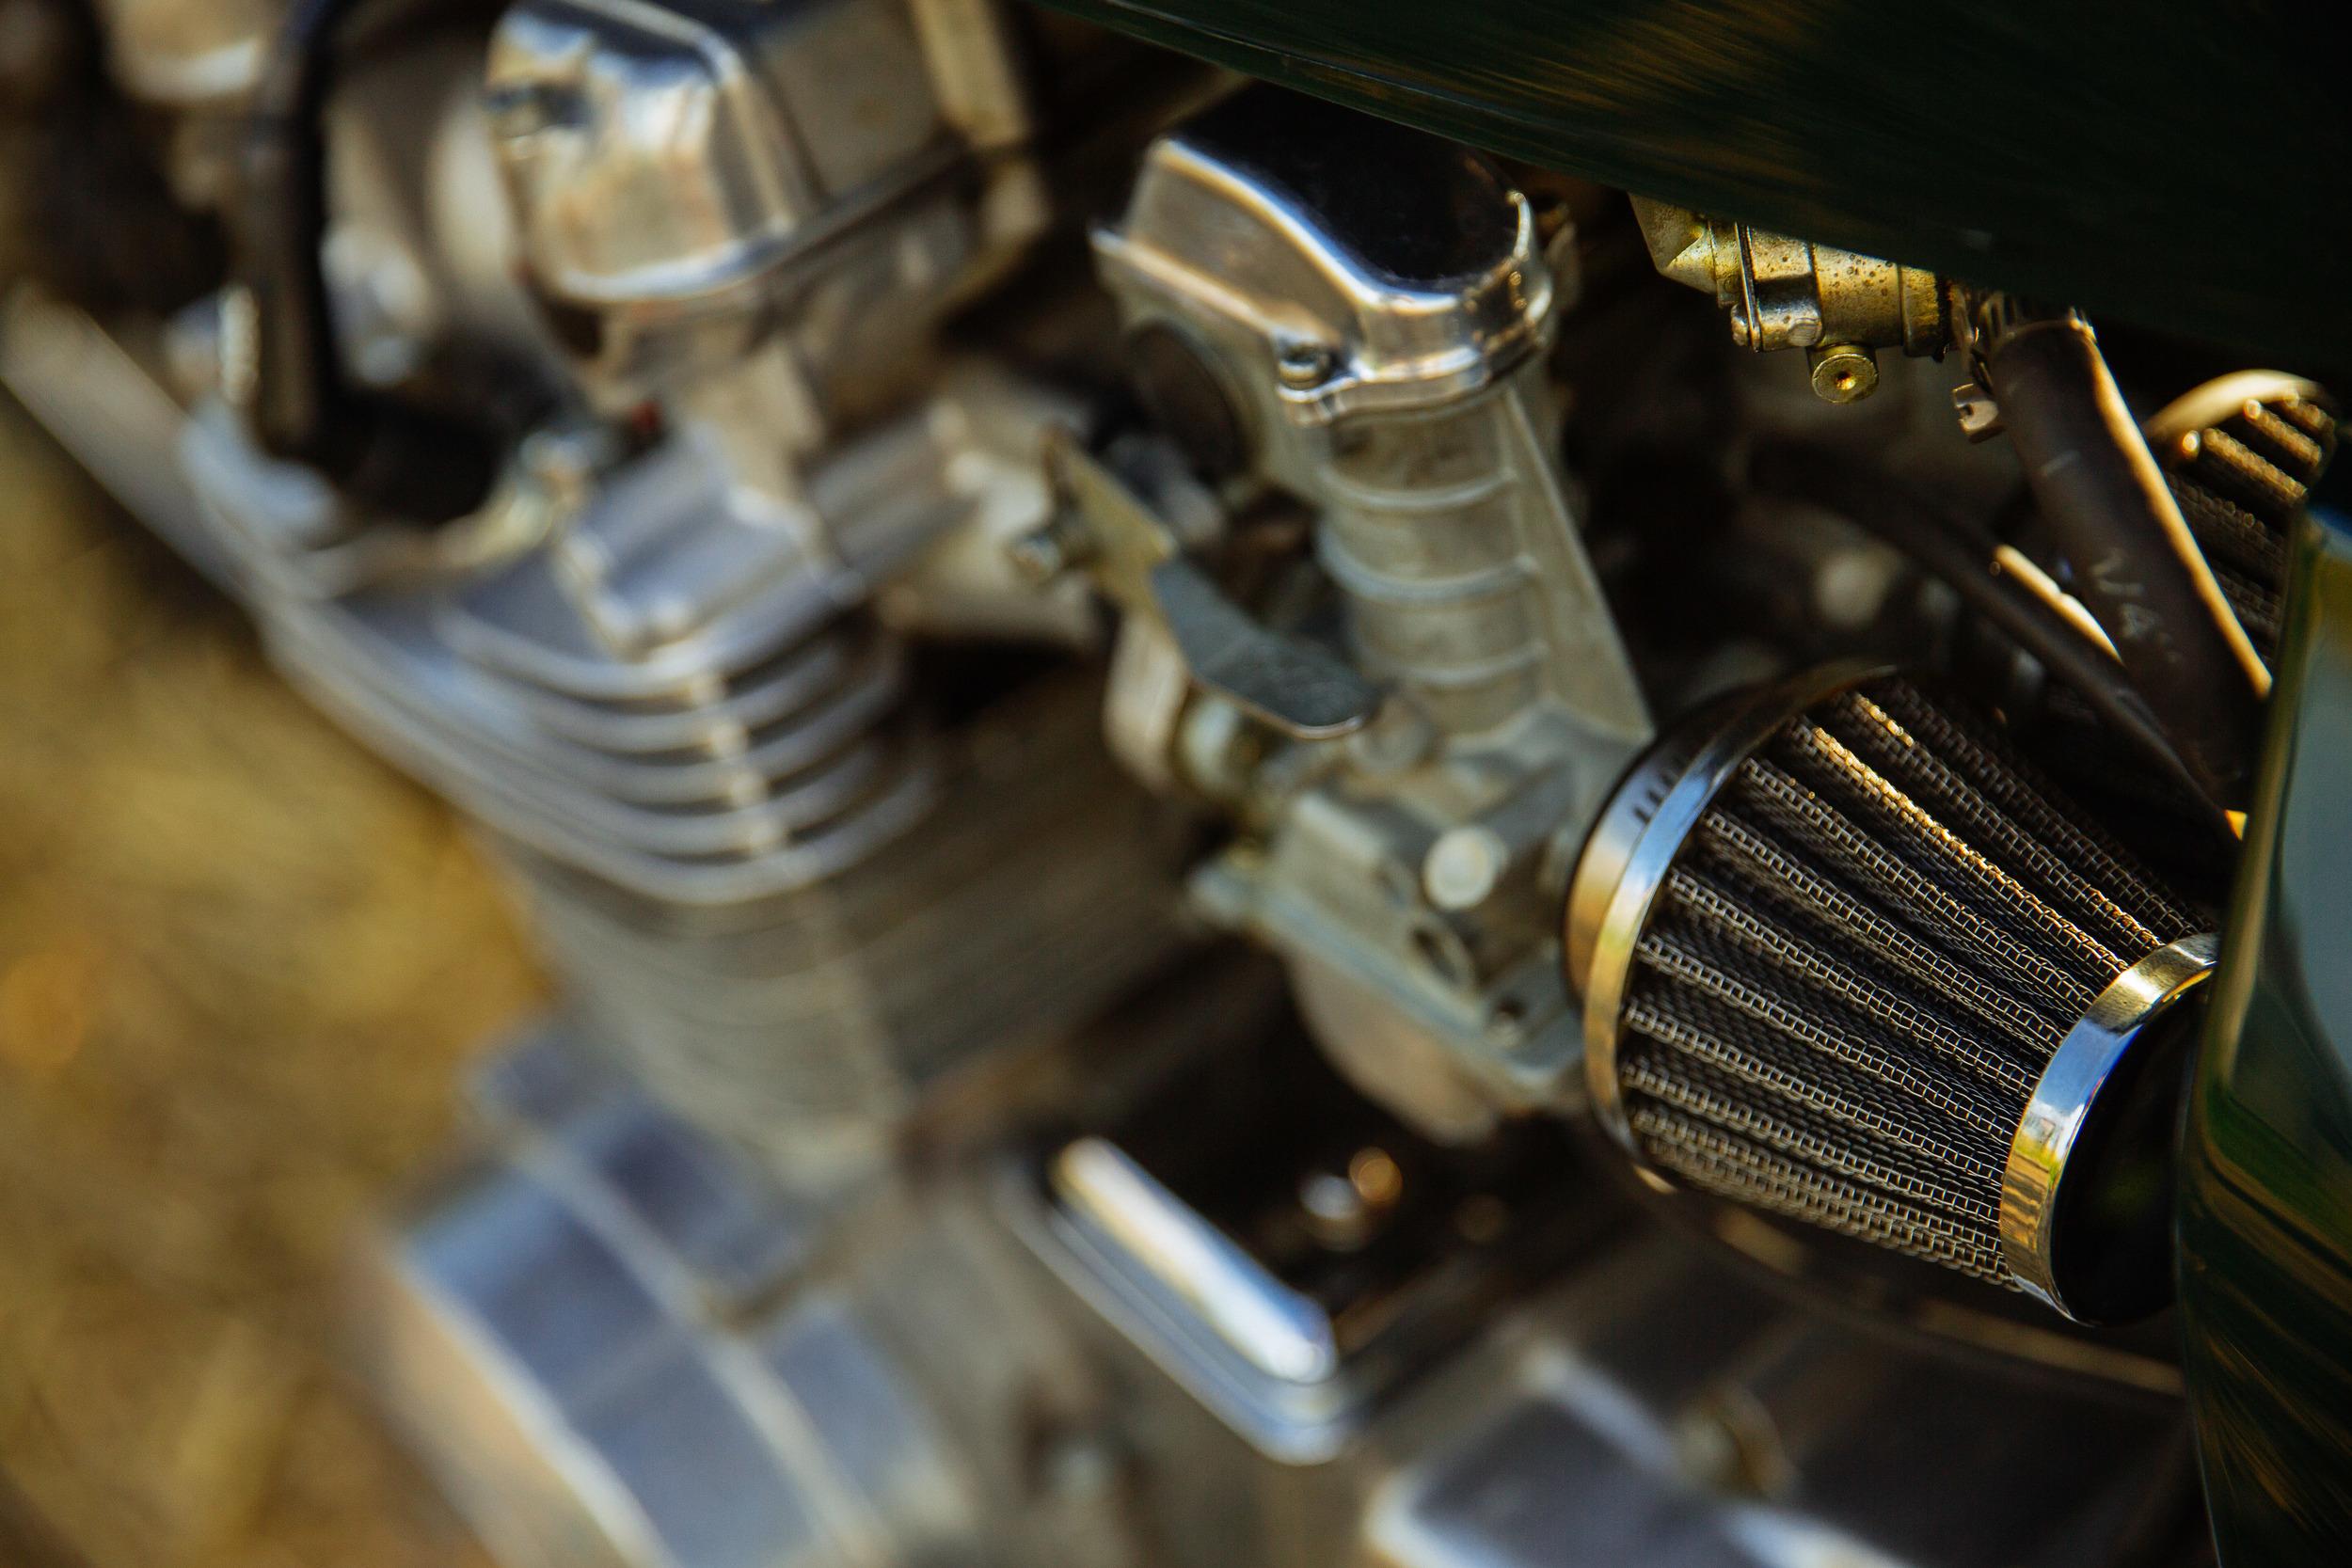 Kawasaki Kz650 Parts on